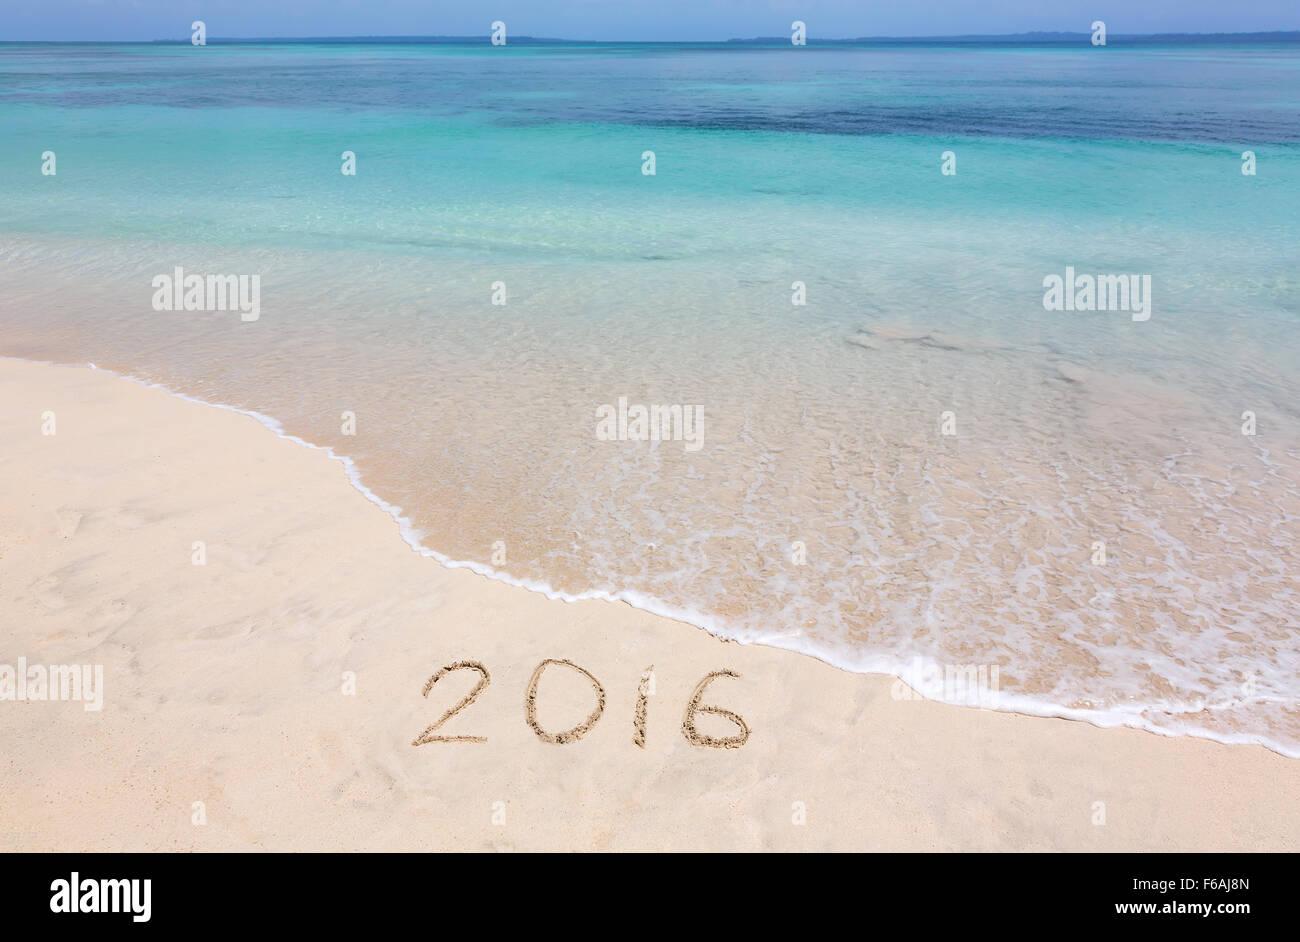 Happy New Year 2016 creative on the beach - Stock Image